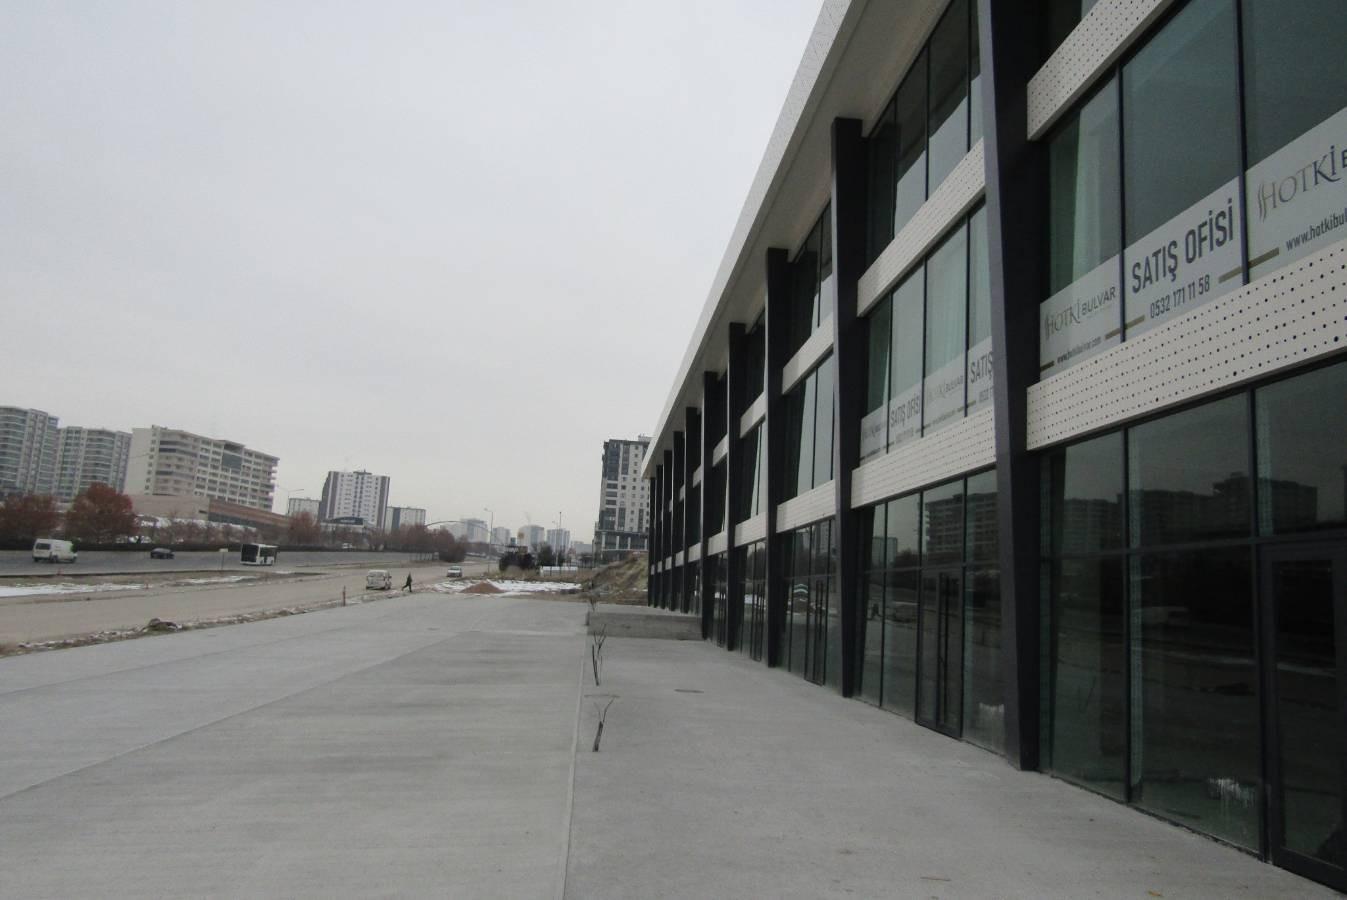 SR EMLAK'TAN YENİ BATI MAH'DE 4+1 160m² LÜKS MANZARALI DAİRE